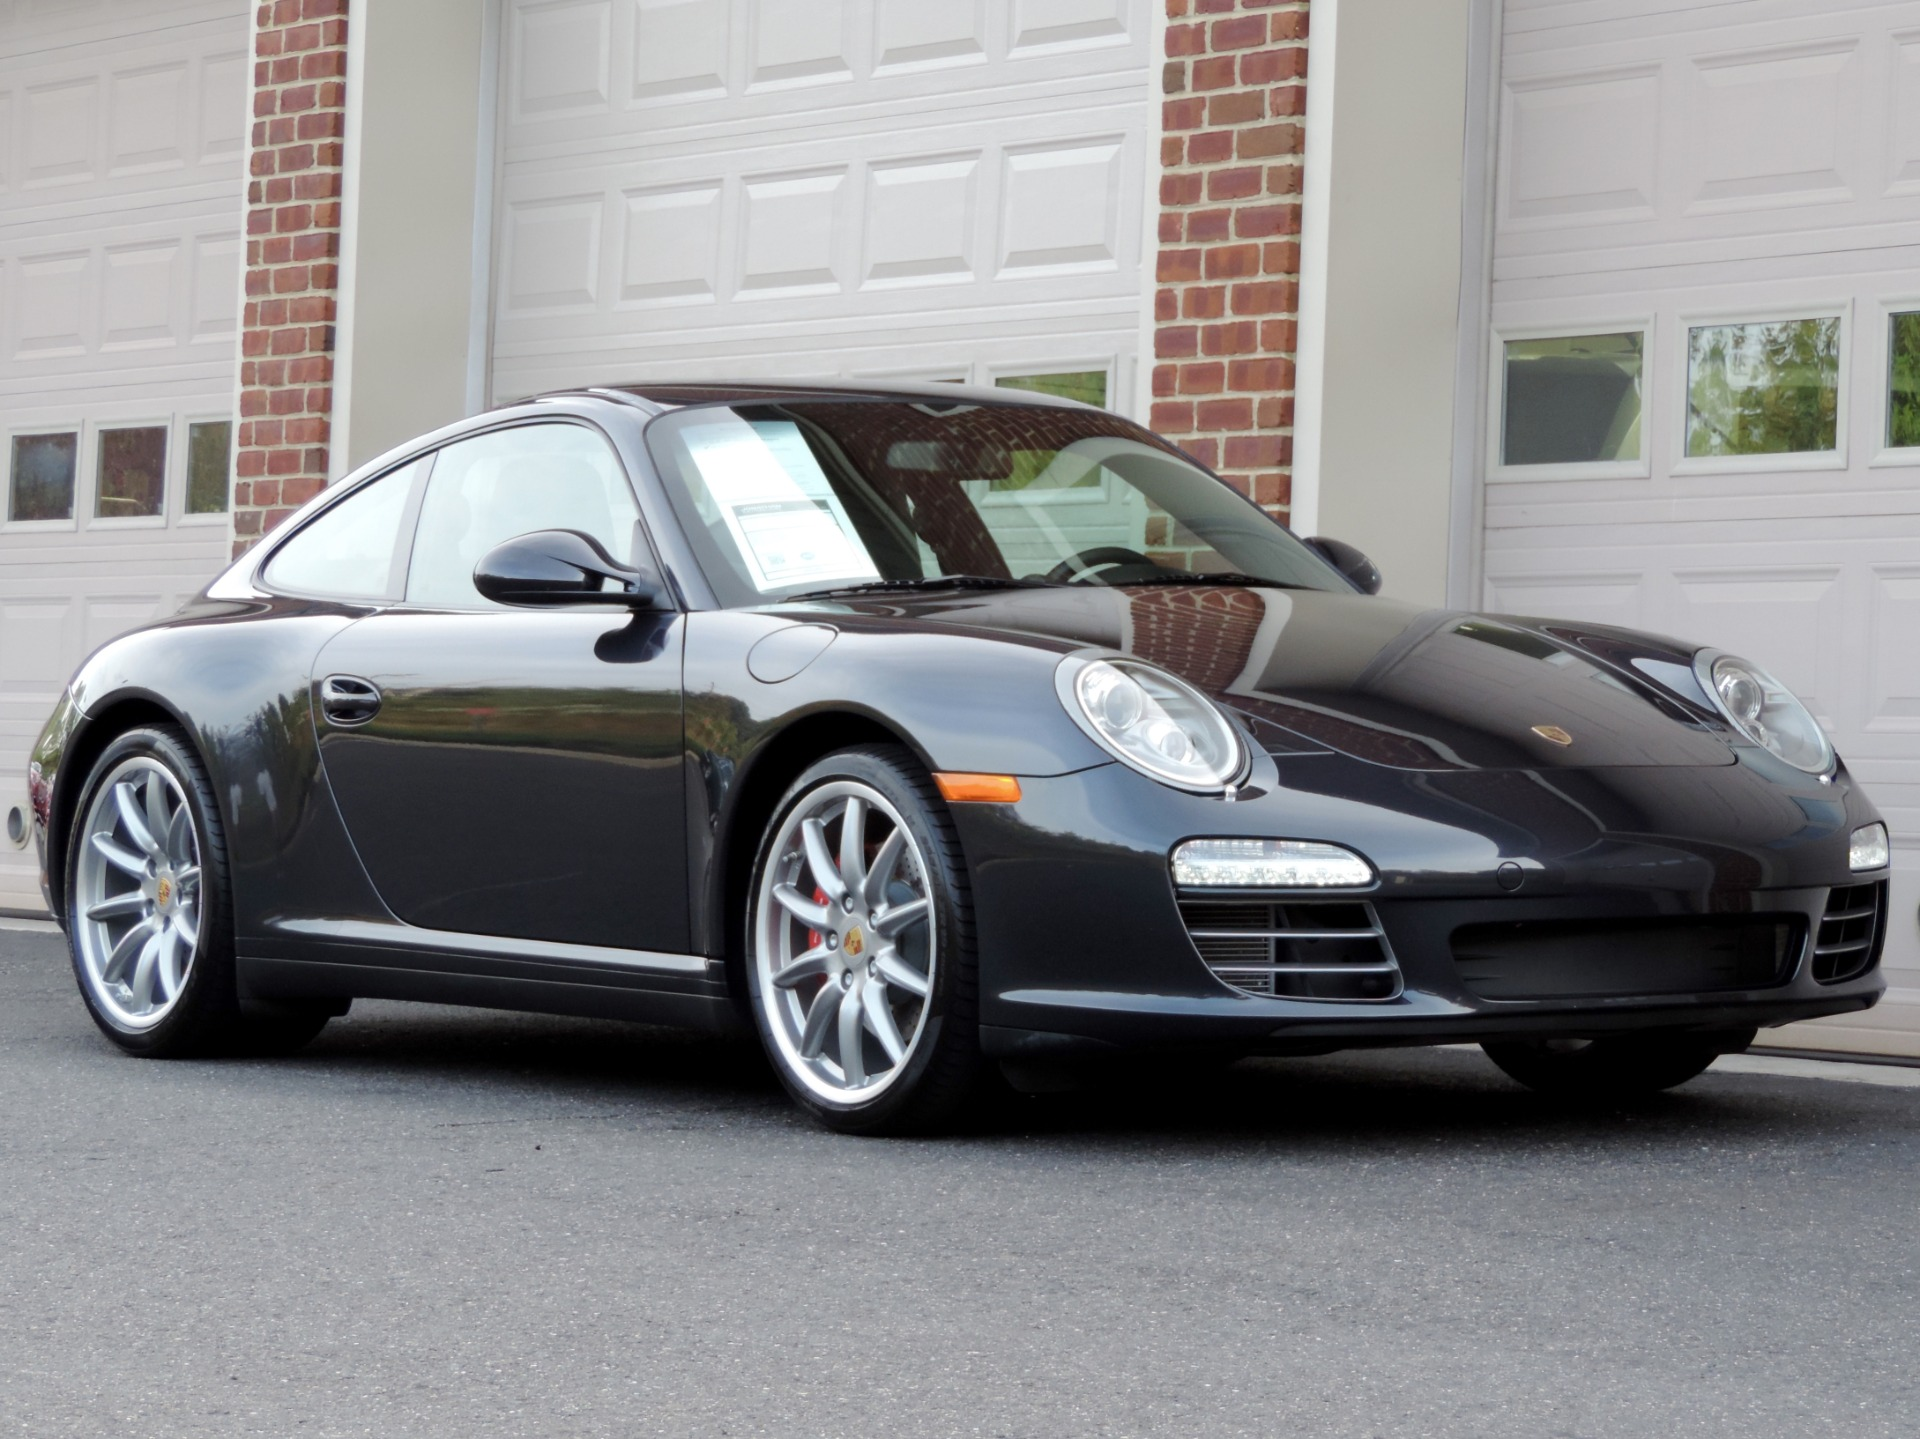 2010 porsche 911 carrera 4s stock s72090 for sale near. Black Bedroom Furniture Sets. Home Design Ideas